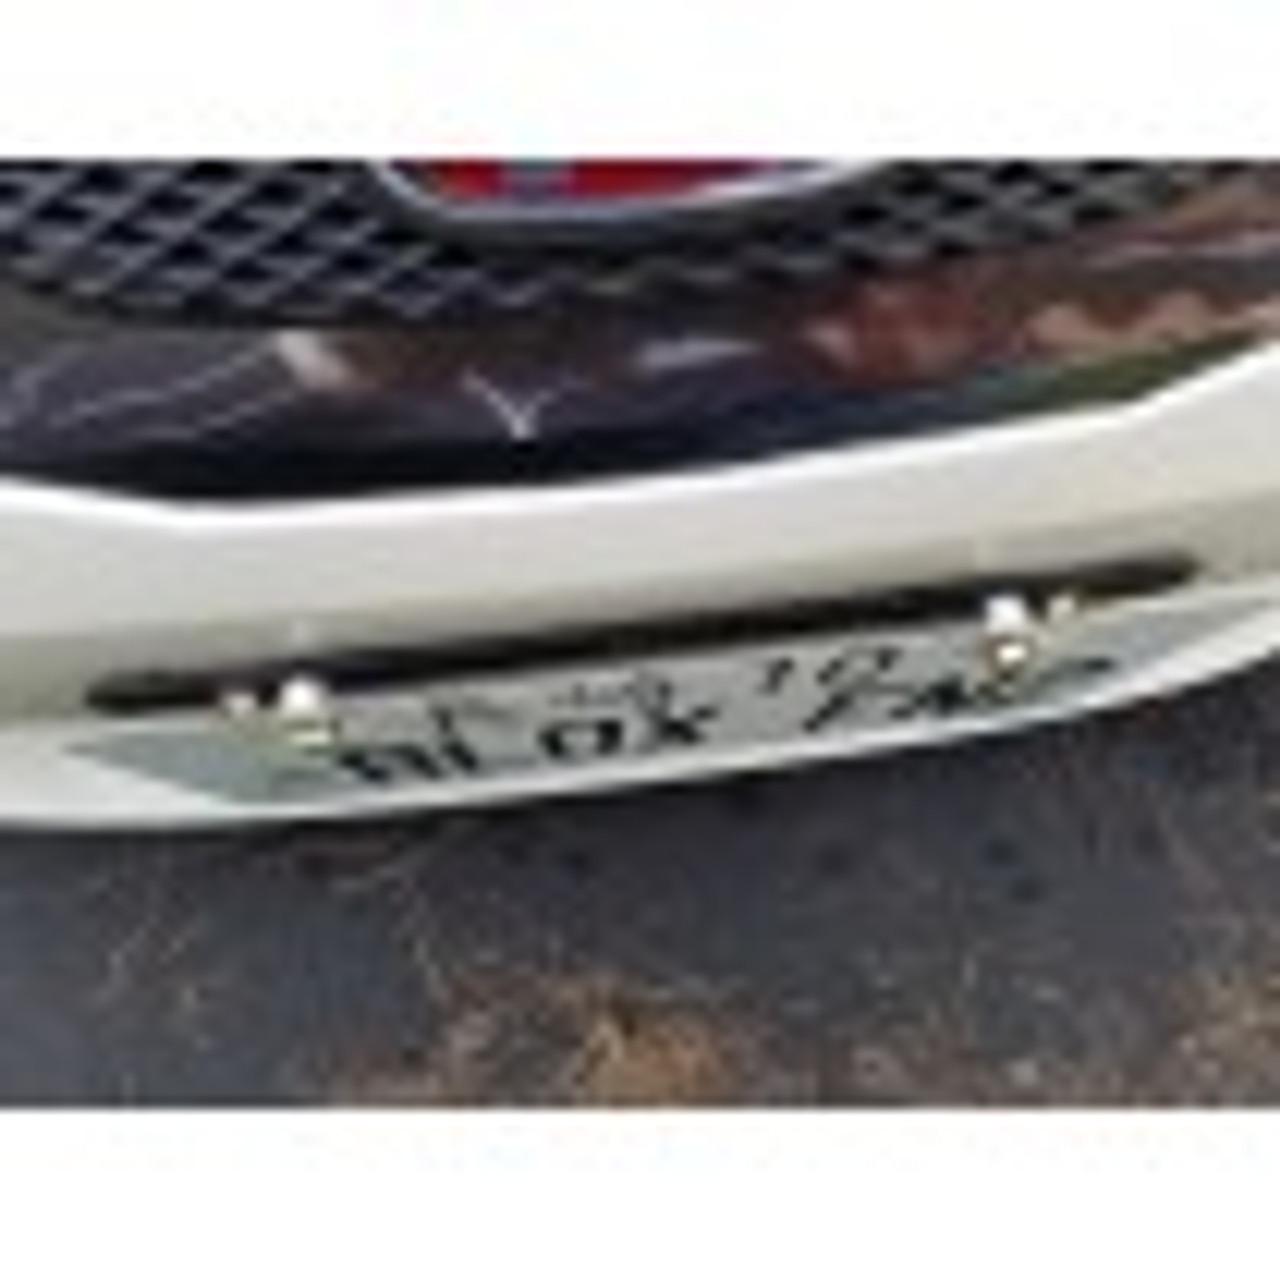 Blox Racing - JDM-TO-USDM License Plate Adapter Kit